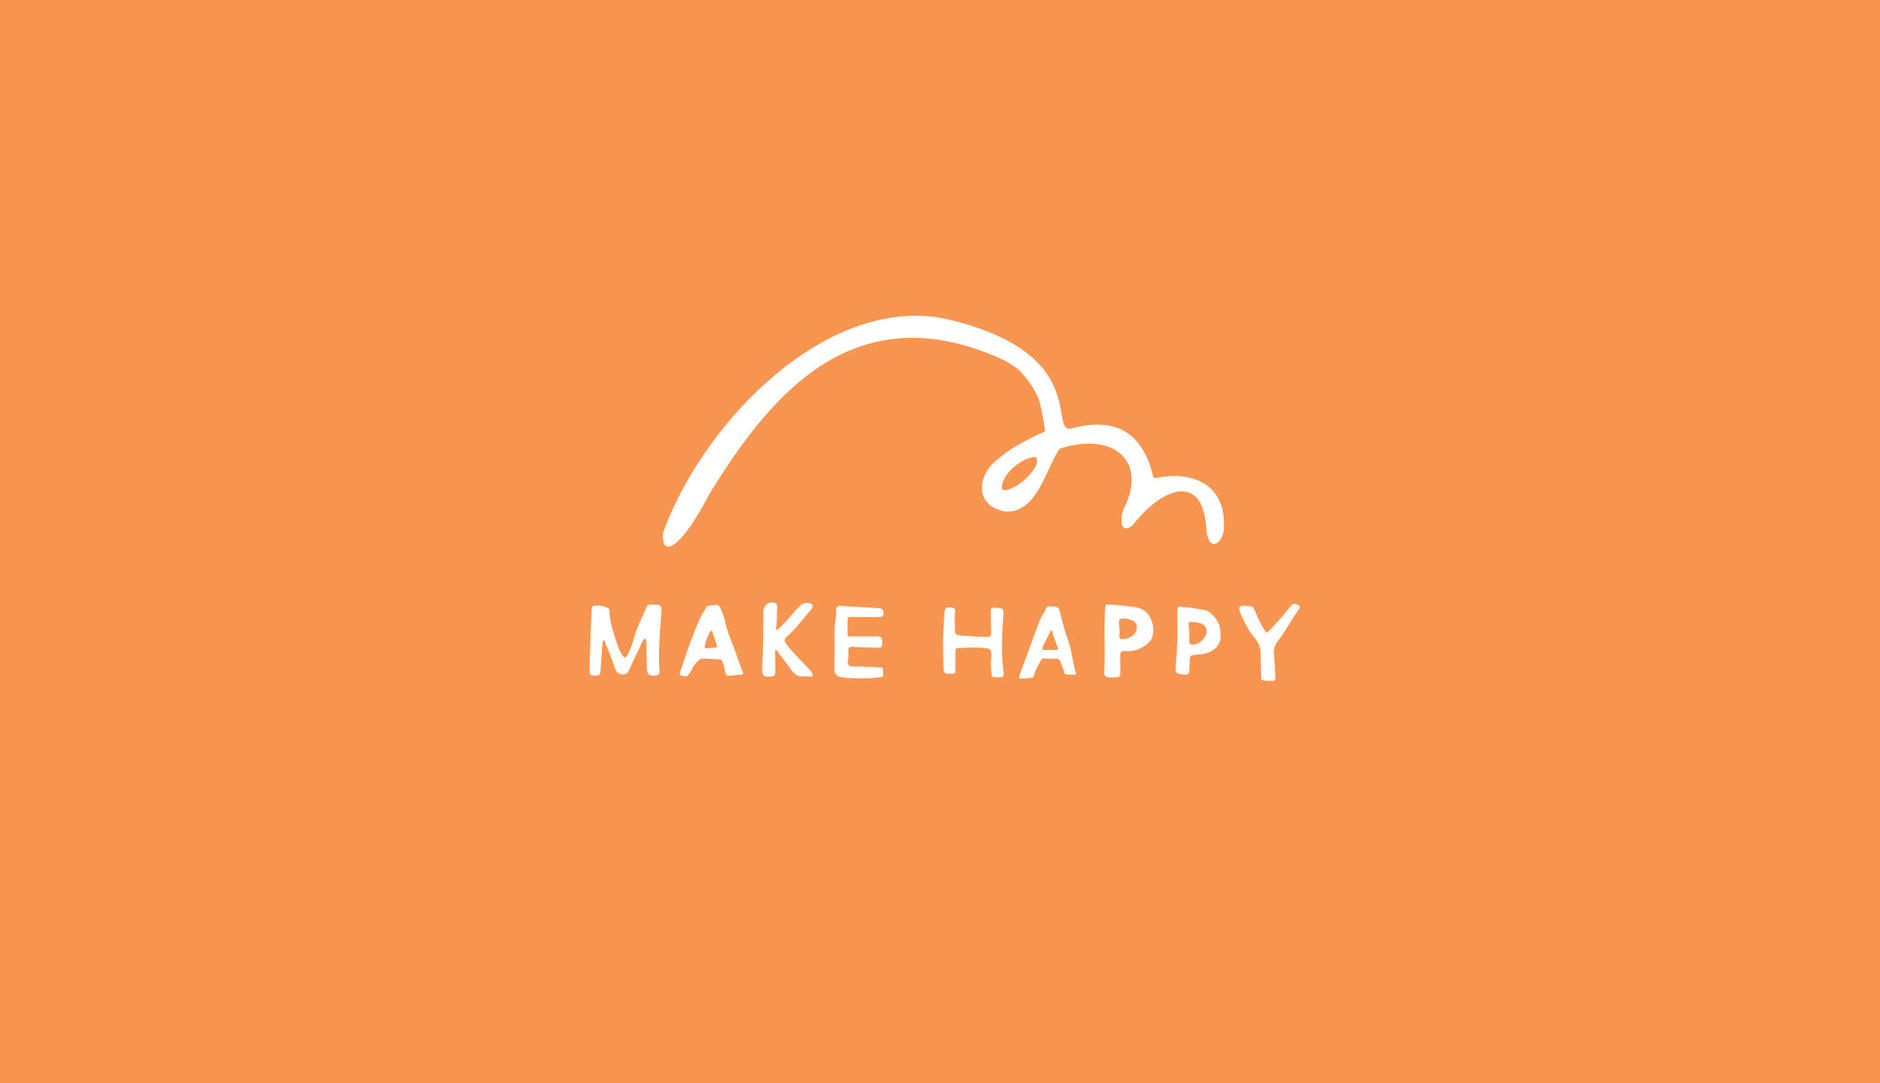 makehappystory's STORE